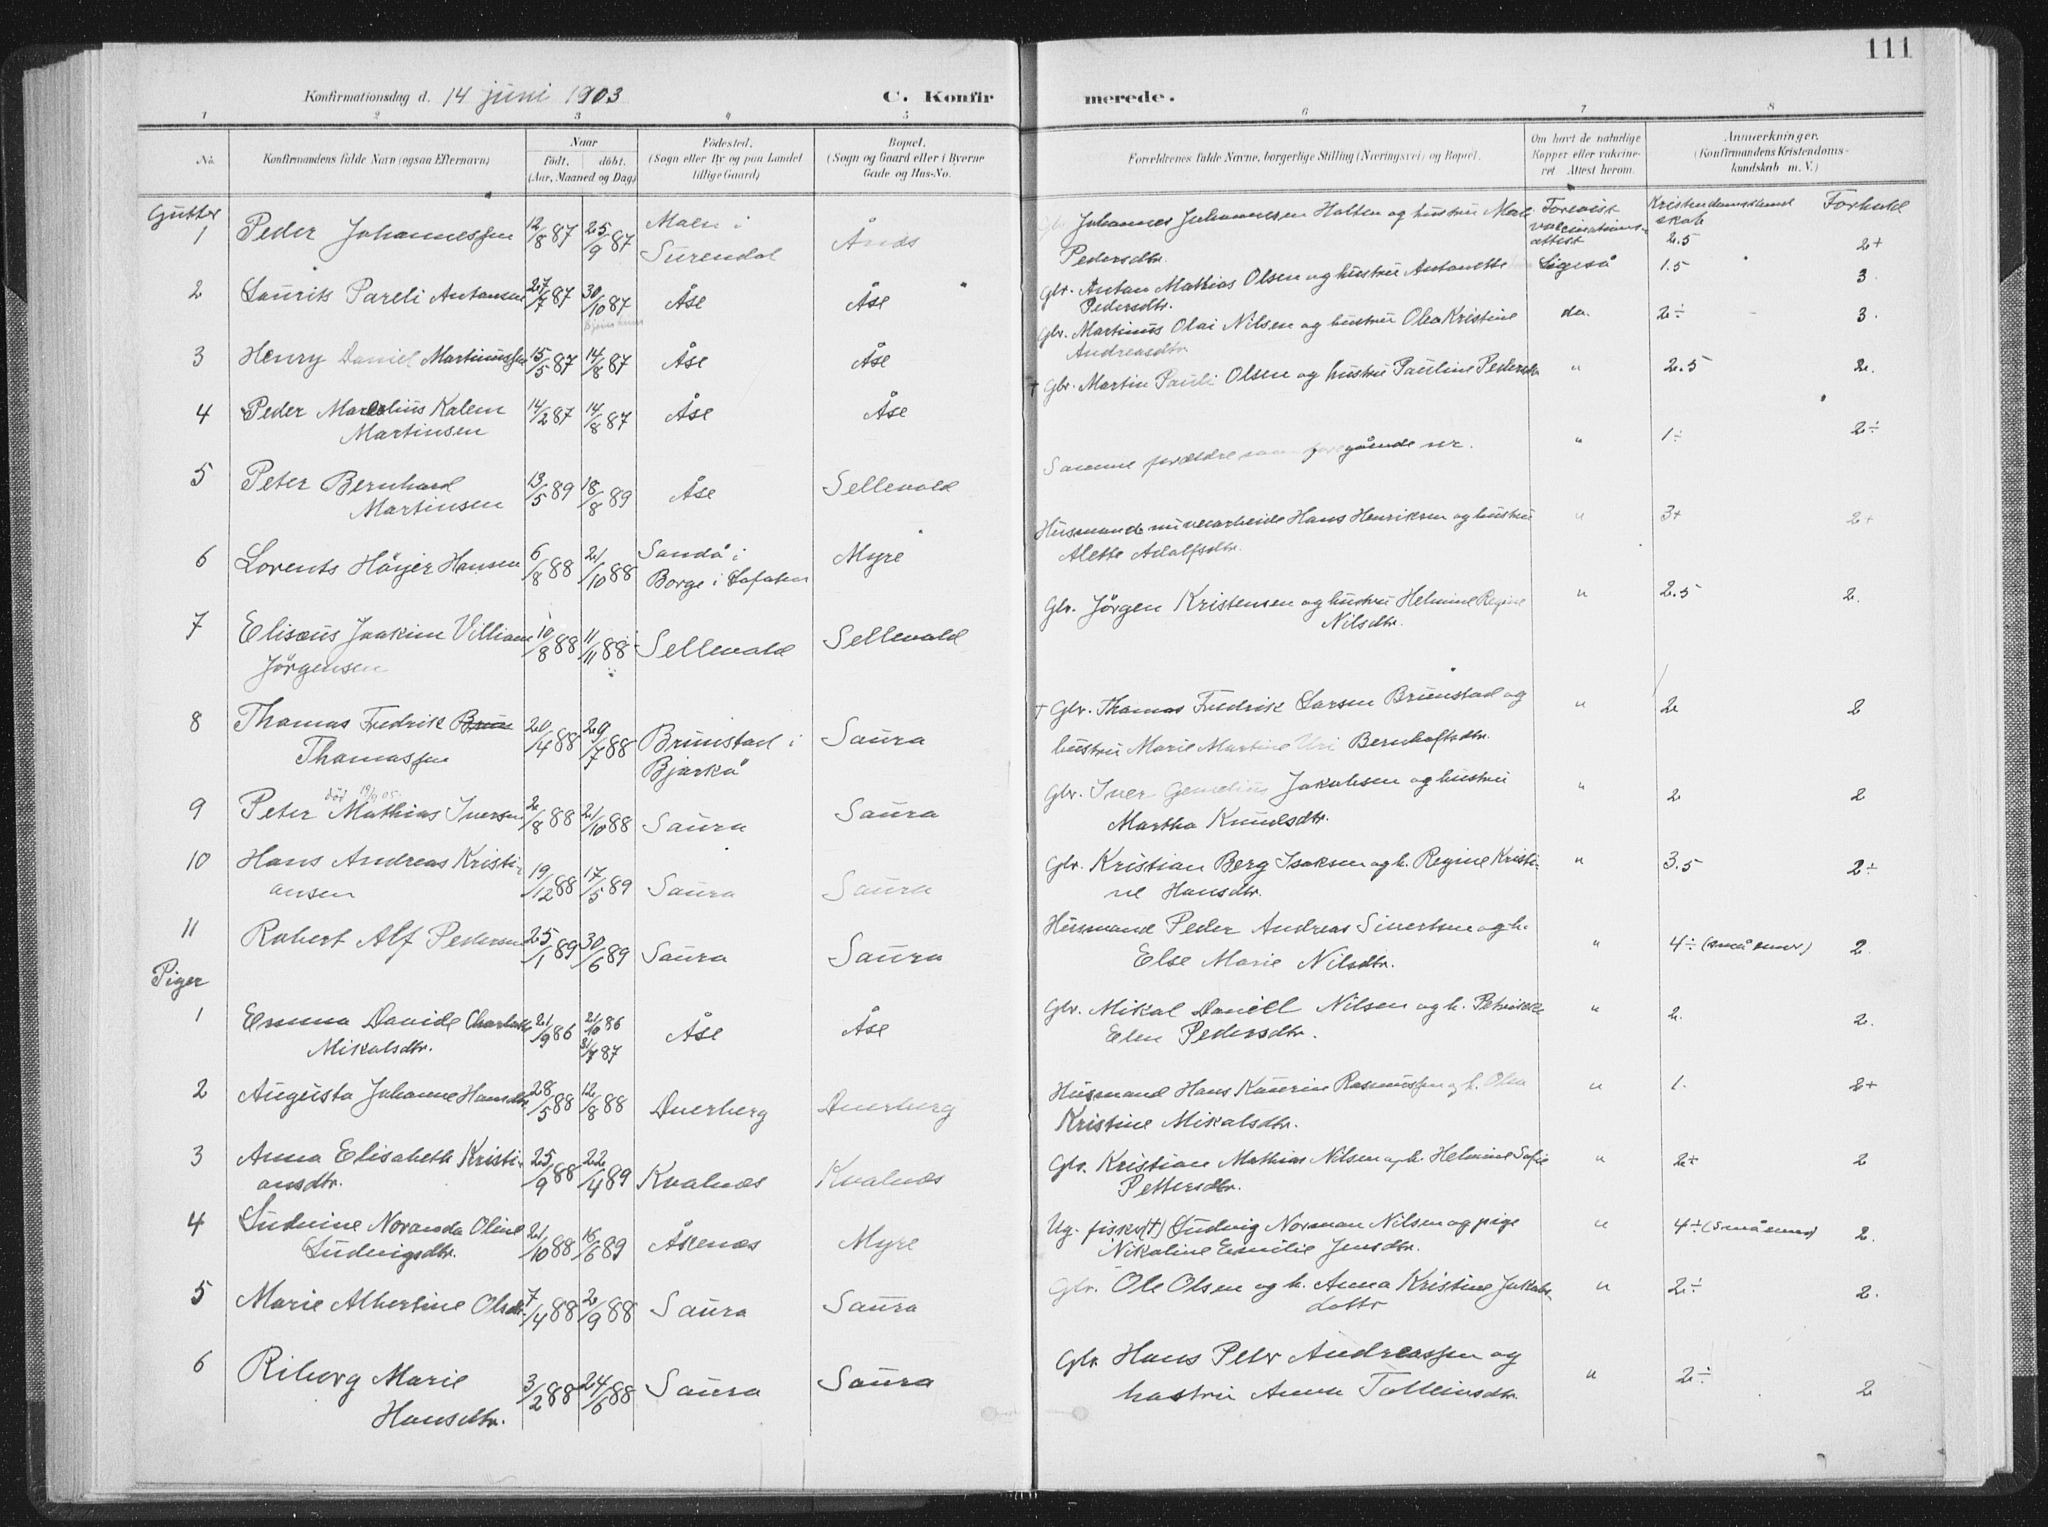 SAT, Ministerialprotokoller, klokkerbøker og fødselsregistre - Nordland, 897/L1400: Ministerialbok nr. 897A07, 1897-1908, s. 111